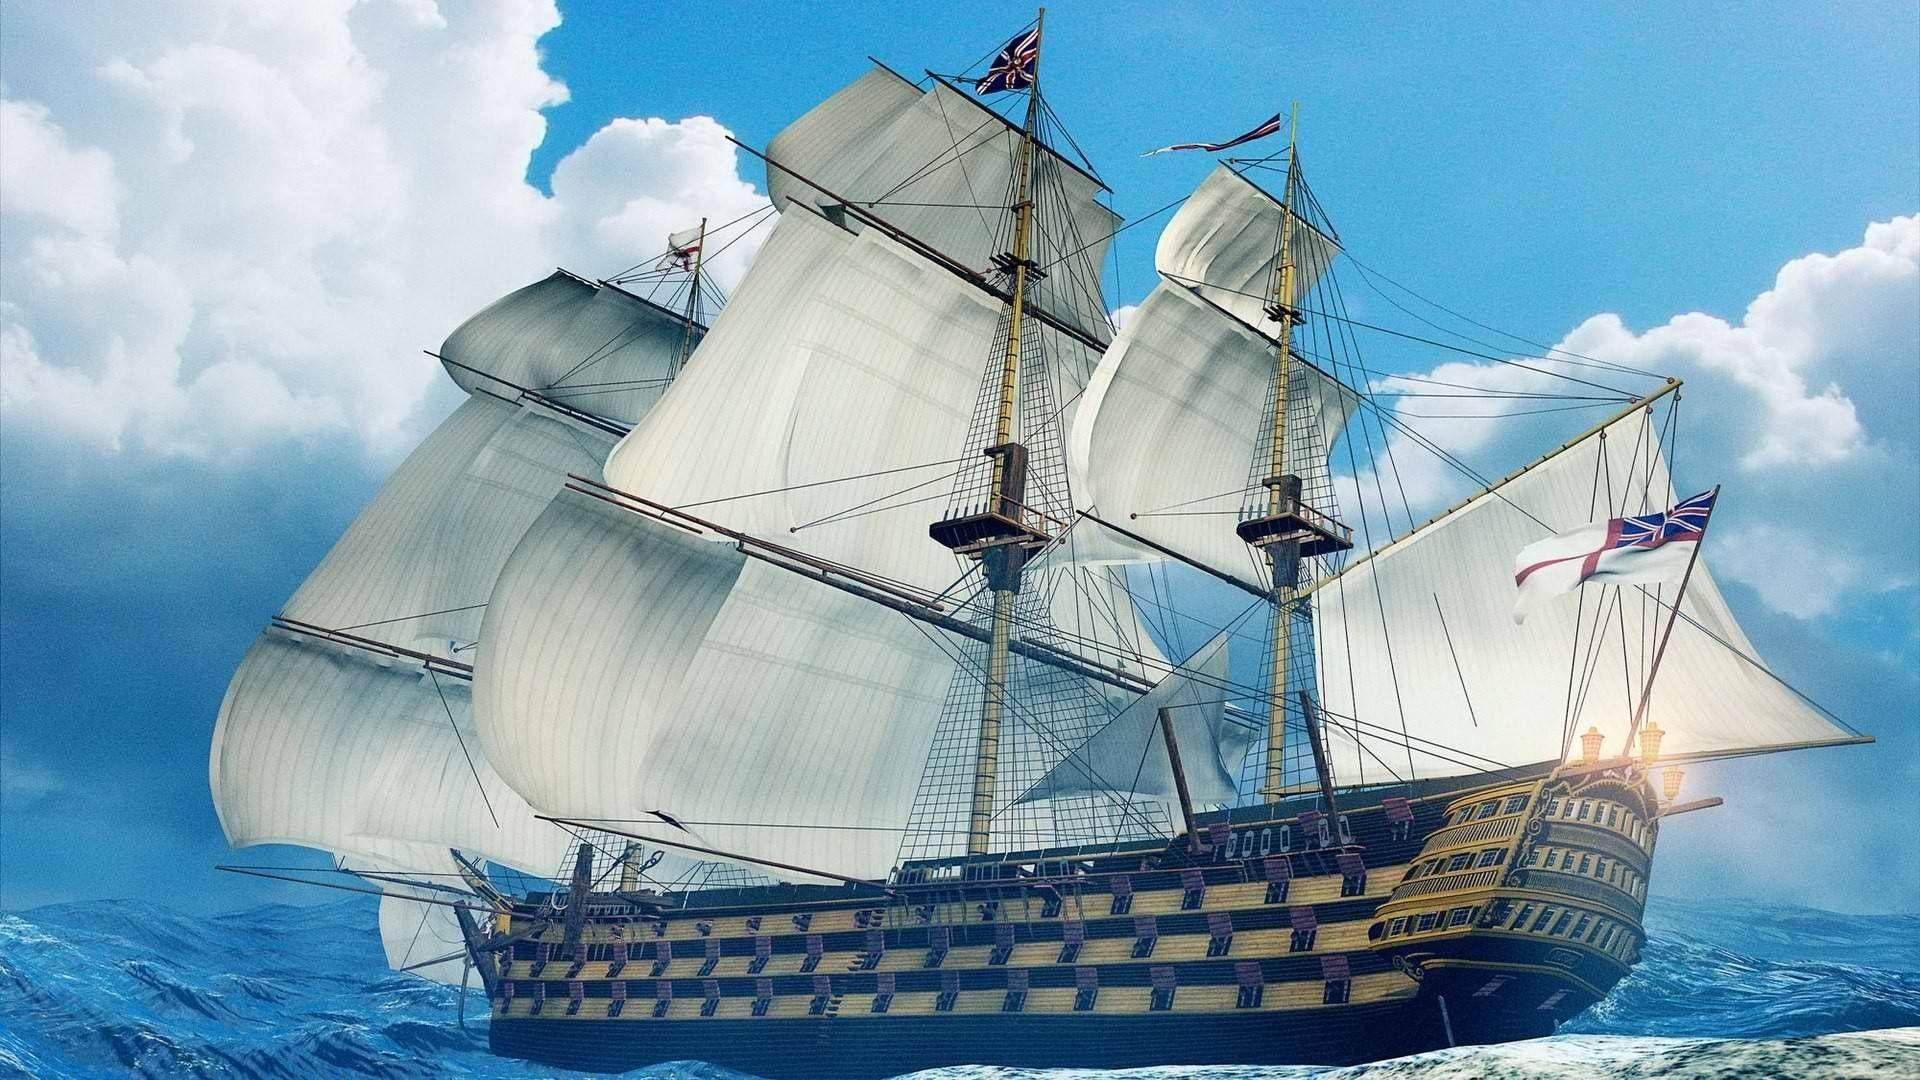 Res: 1920x1080, Art HD Ship Wallpaper 1920×1080 Beautiful Ship Image http://nirhara.